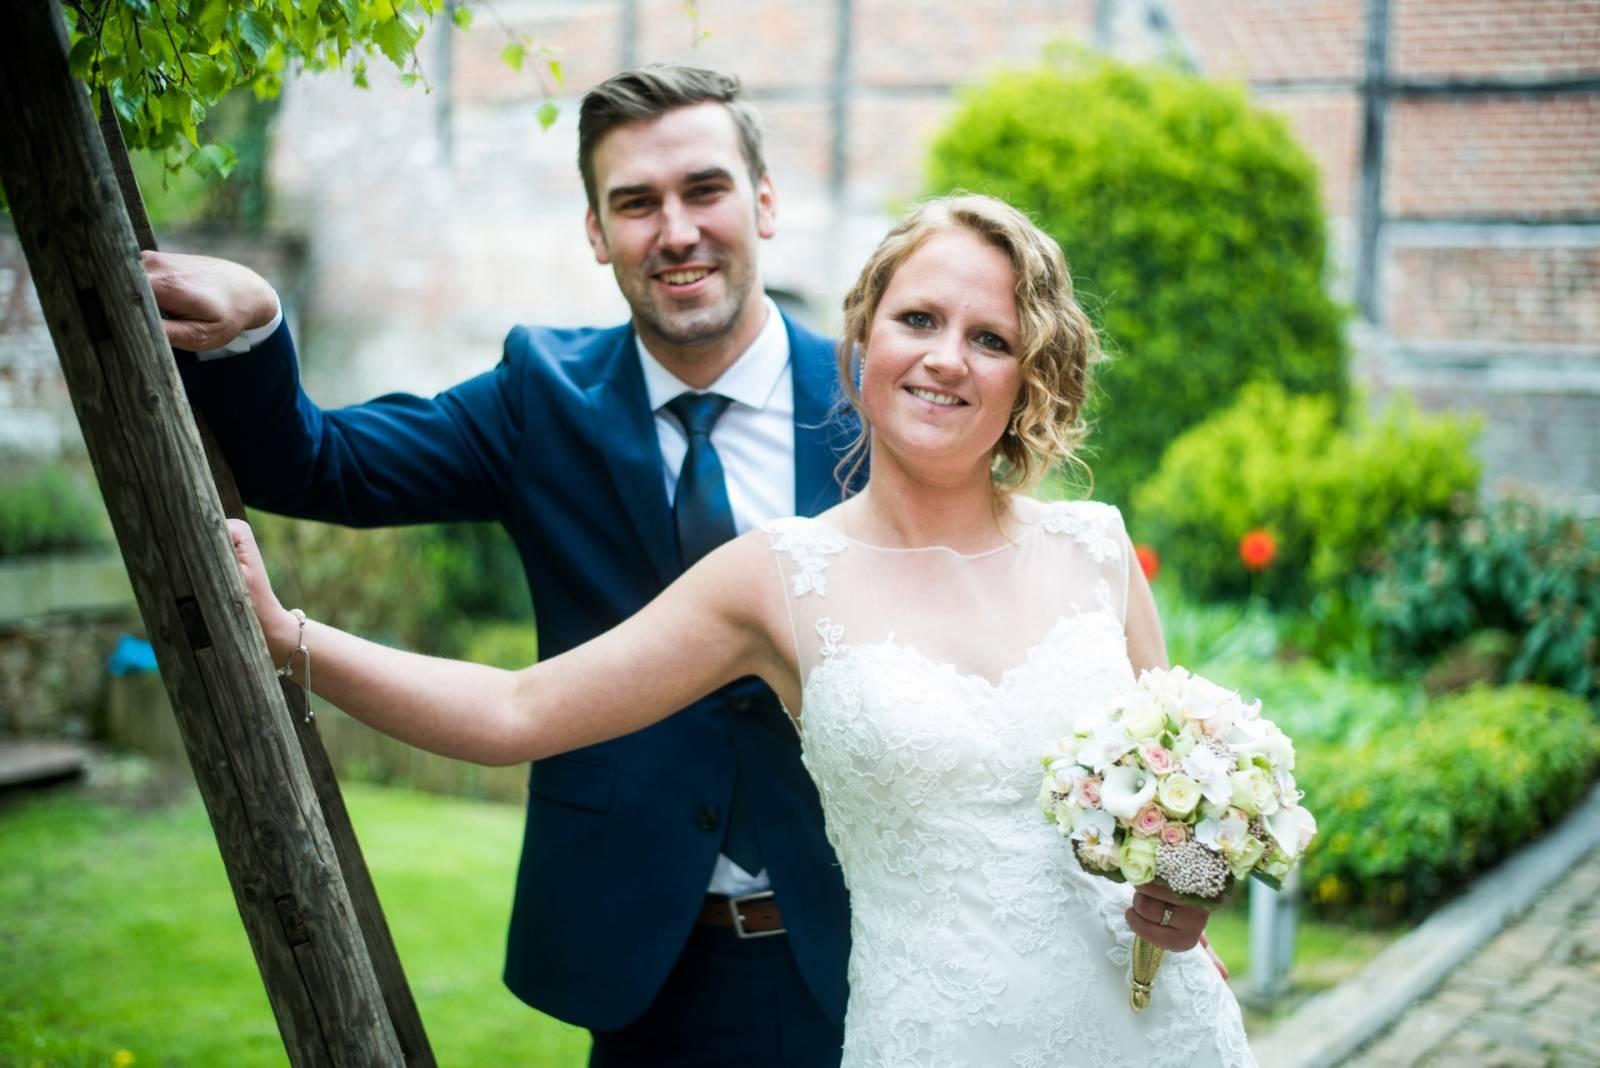 Michèle Feyaerts - Bruidskapsel - Bruidsmake-up - House of Weddings - 14